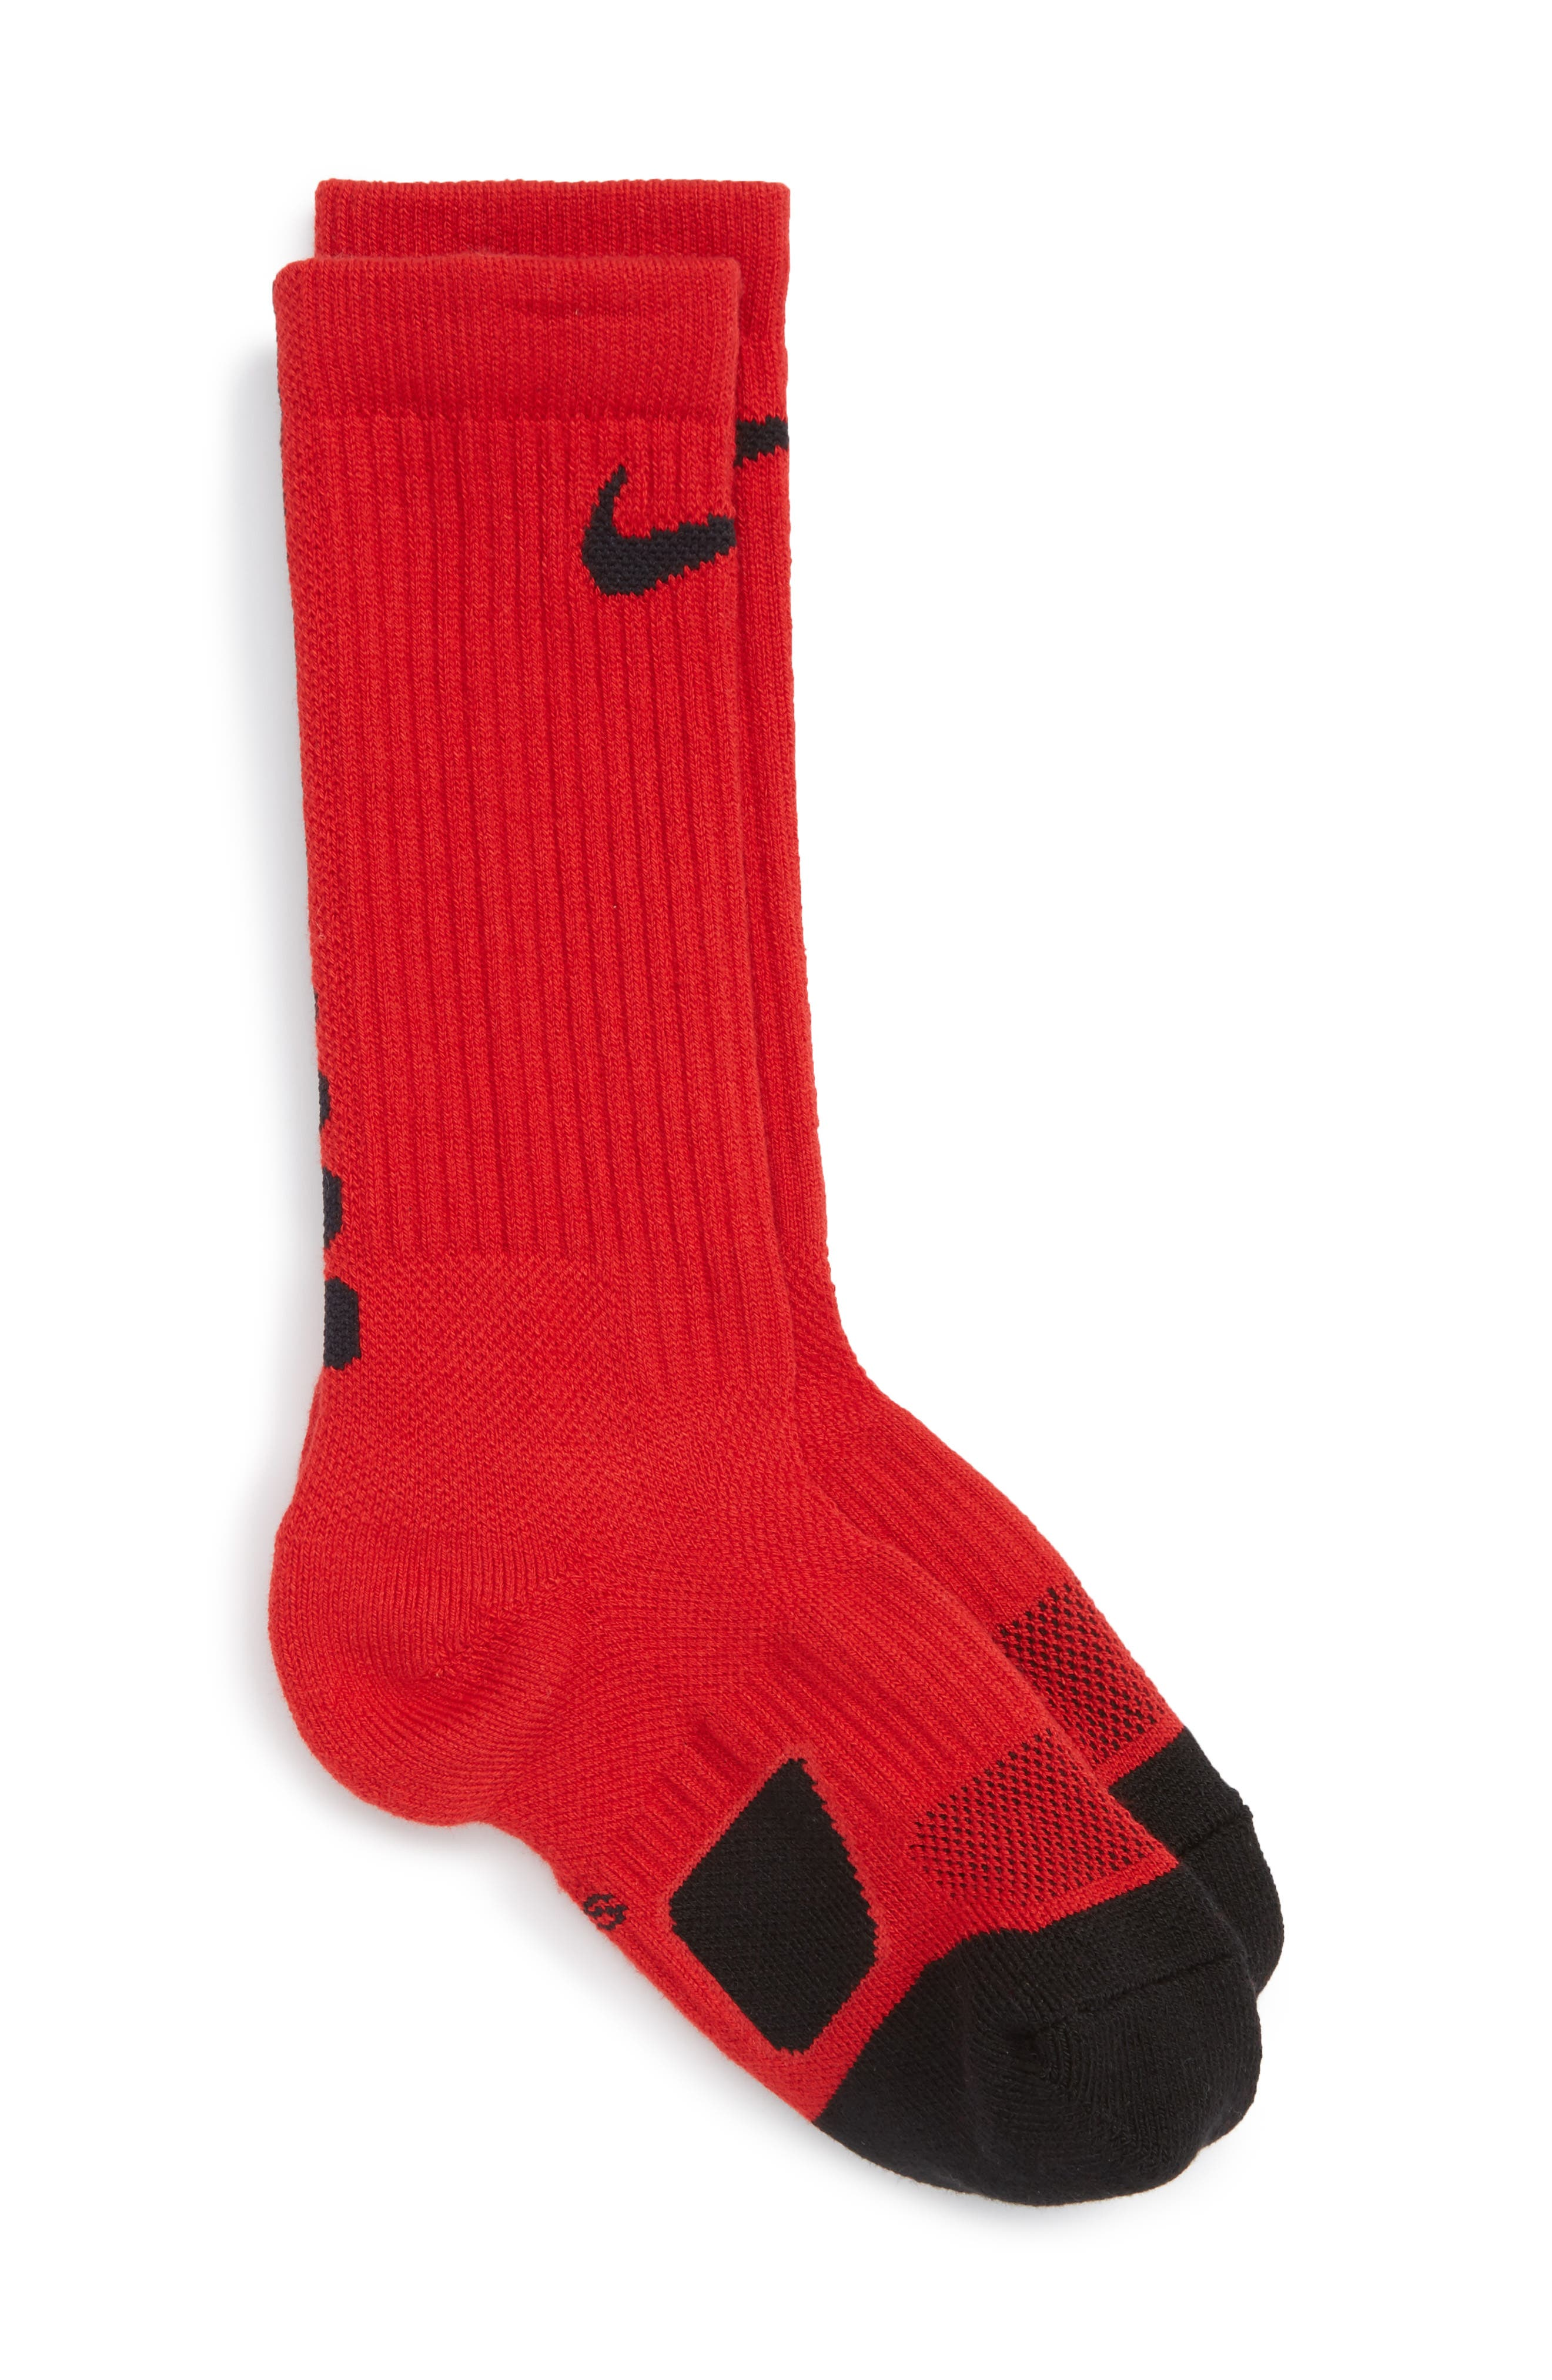 Alternate Image 1 Selected - Nike Elite Versatility Crew Socks (Big Kid)